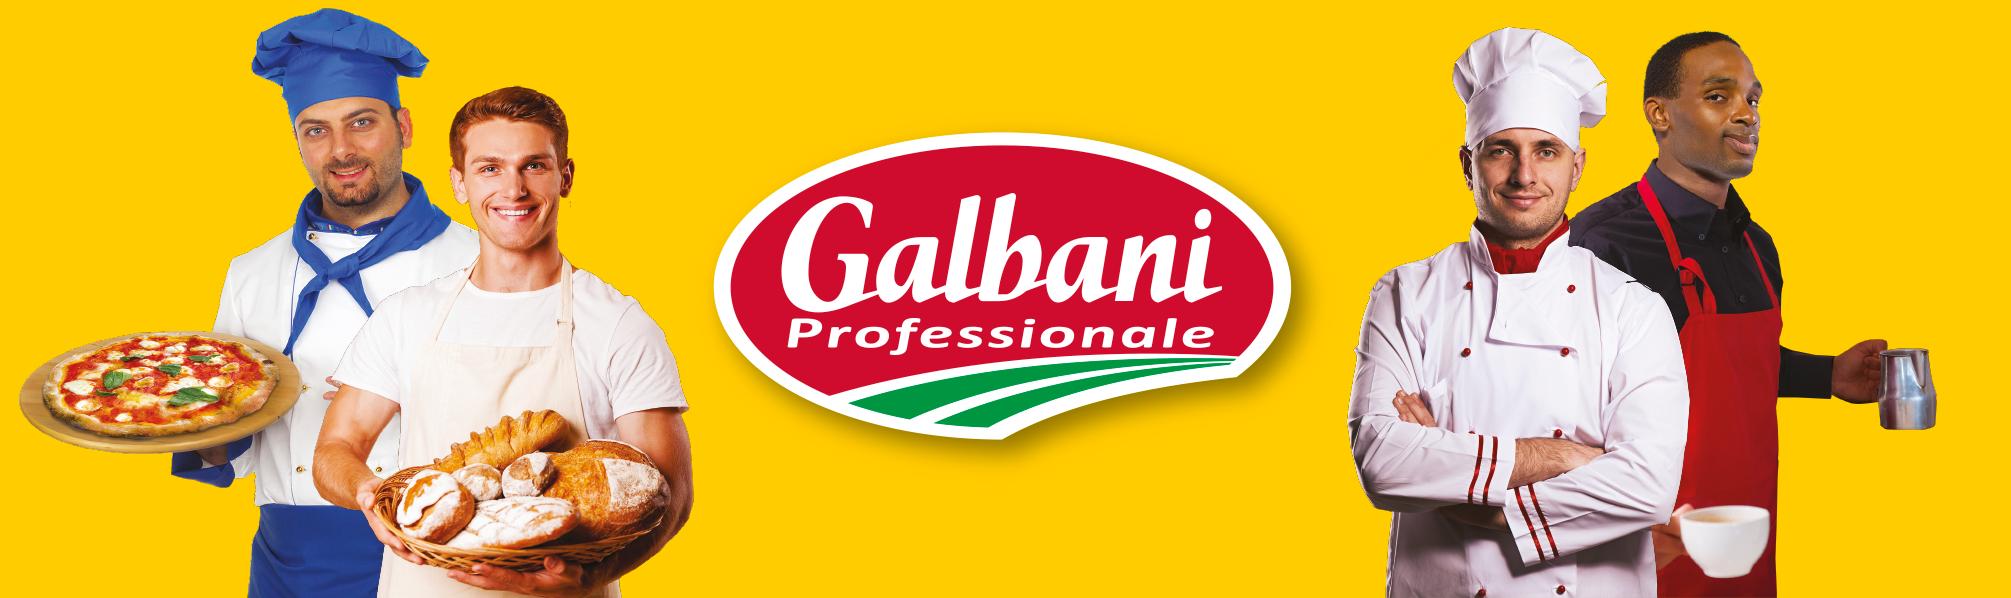 GALBANIPROFESSIONALHEADER.png